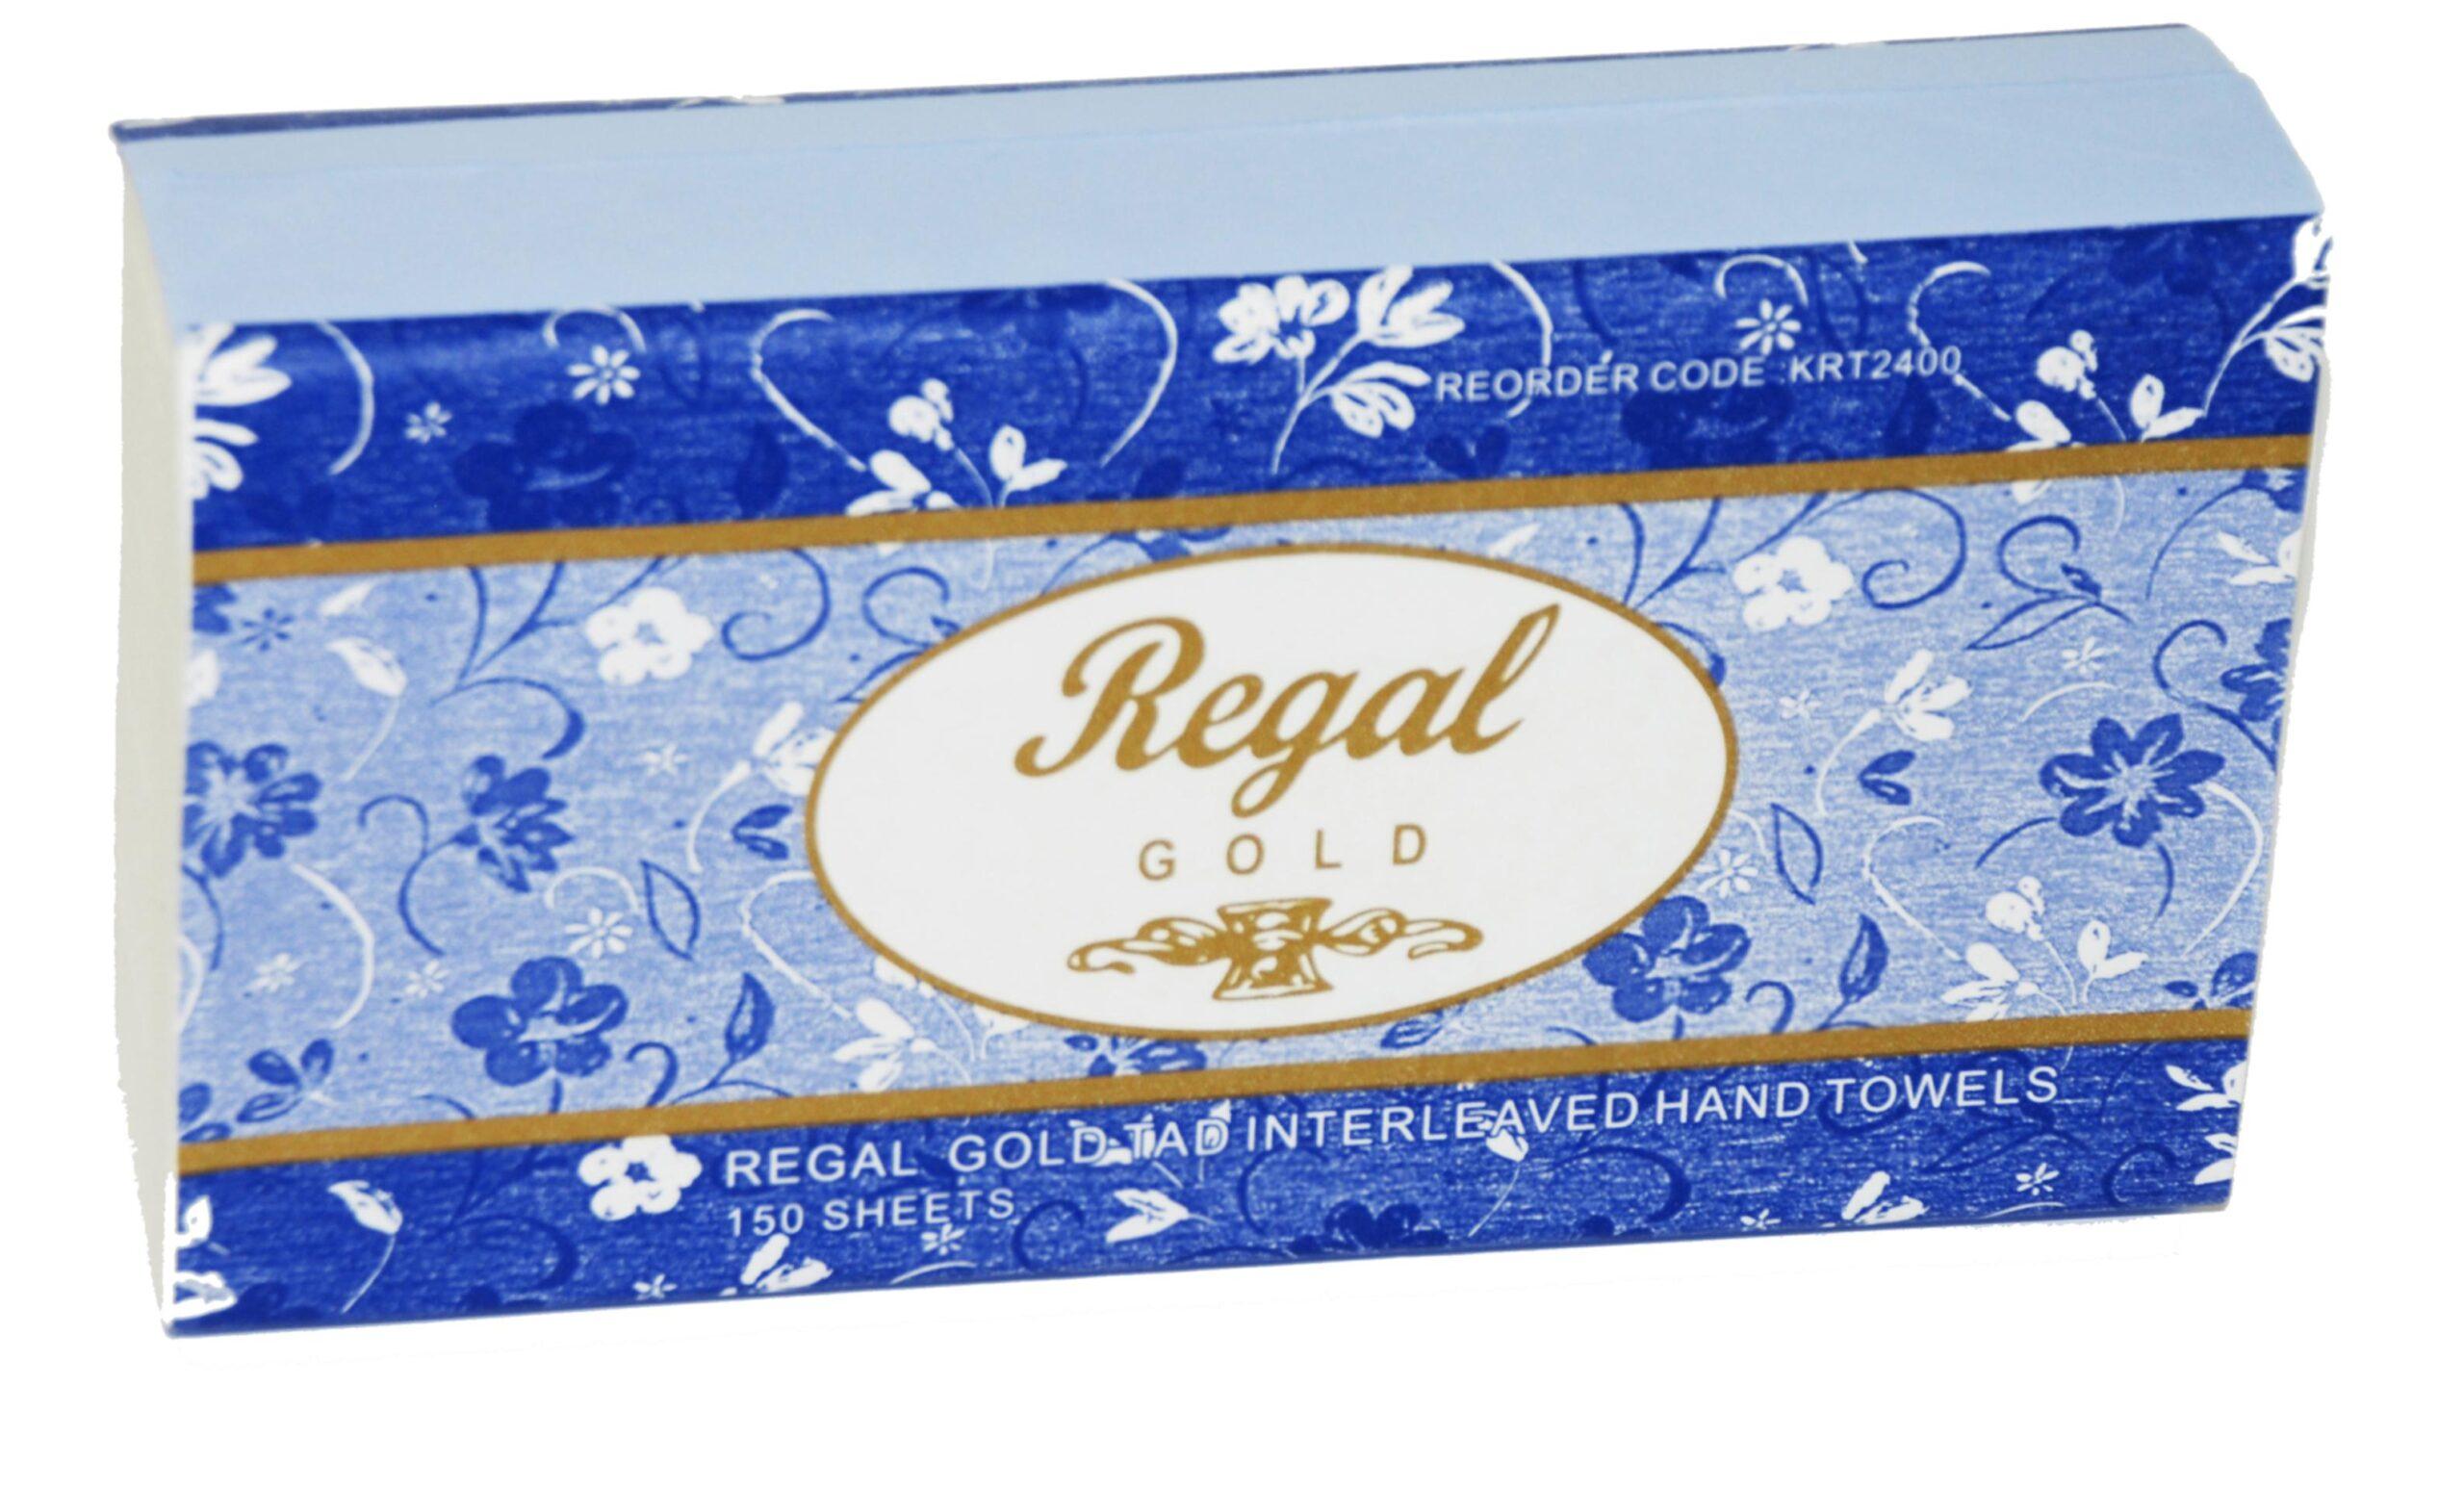 Regal Gold Tad Interleaved Hand Towel 150 Sheet X 16 Packs